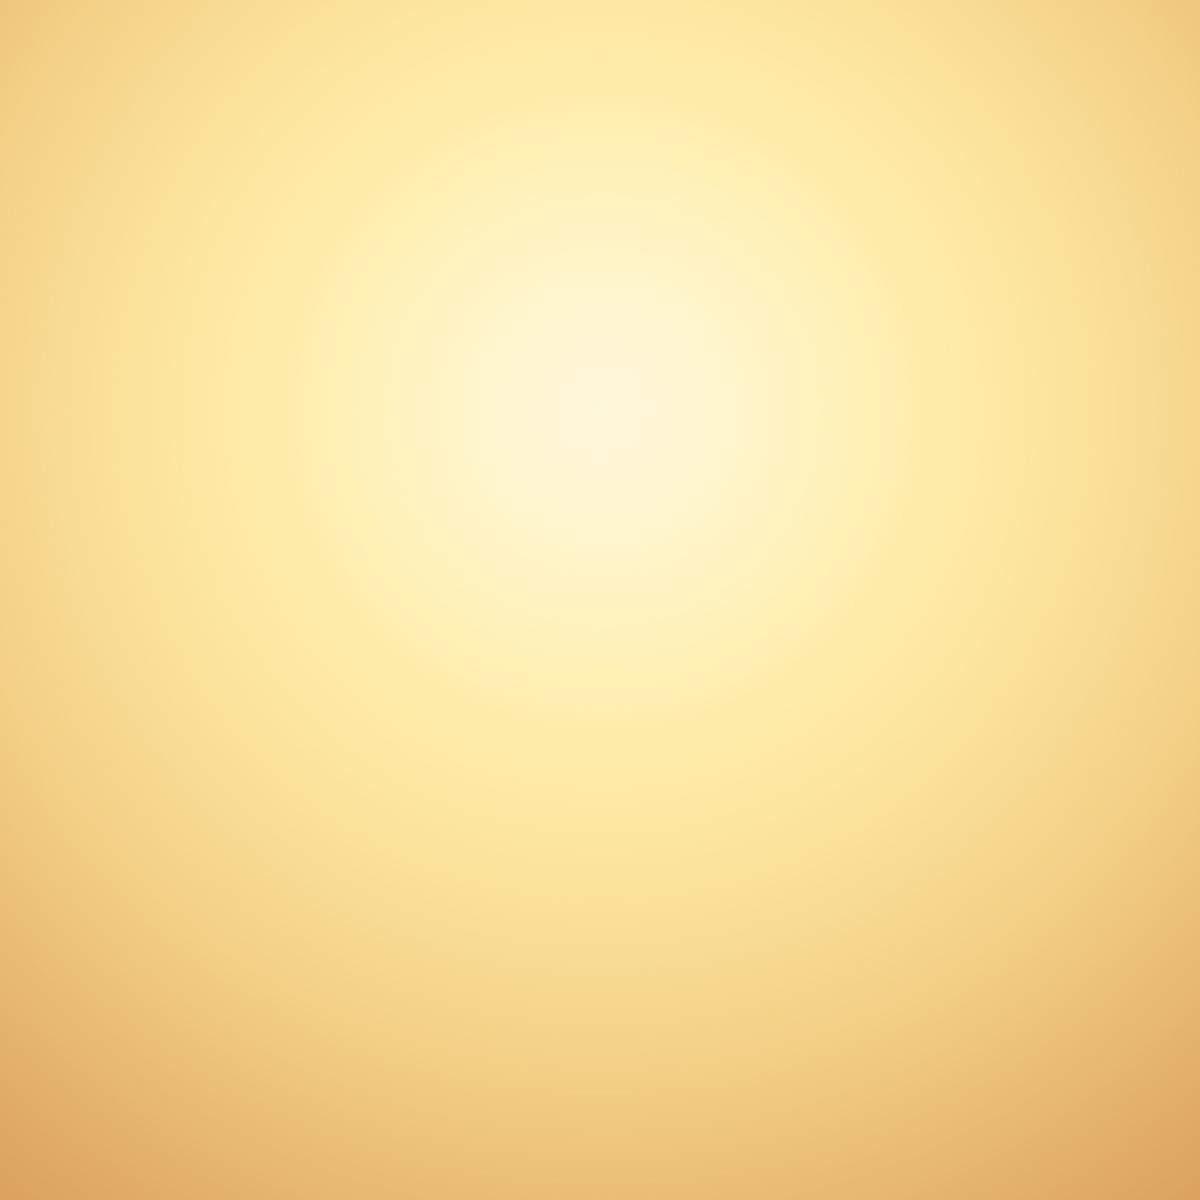 TORCHSTAR Recessed Lighting Kit: 3-Inch ETL-listed Airtight IC Housing + White Swivel Trim + LED Dimmable GU10 Light Bulb Warm White, Rotatable Spotlight, Decorative Retrofit Downlight, Pack of 6 by TORCHSTAR (Image #2)